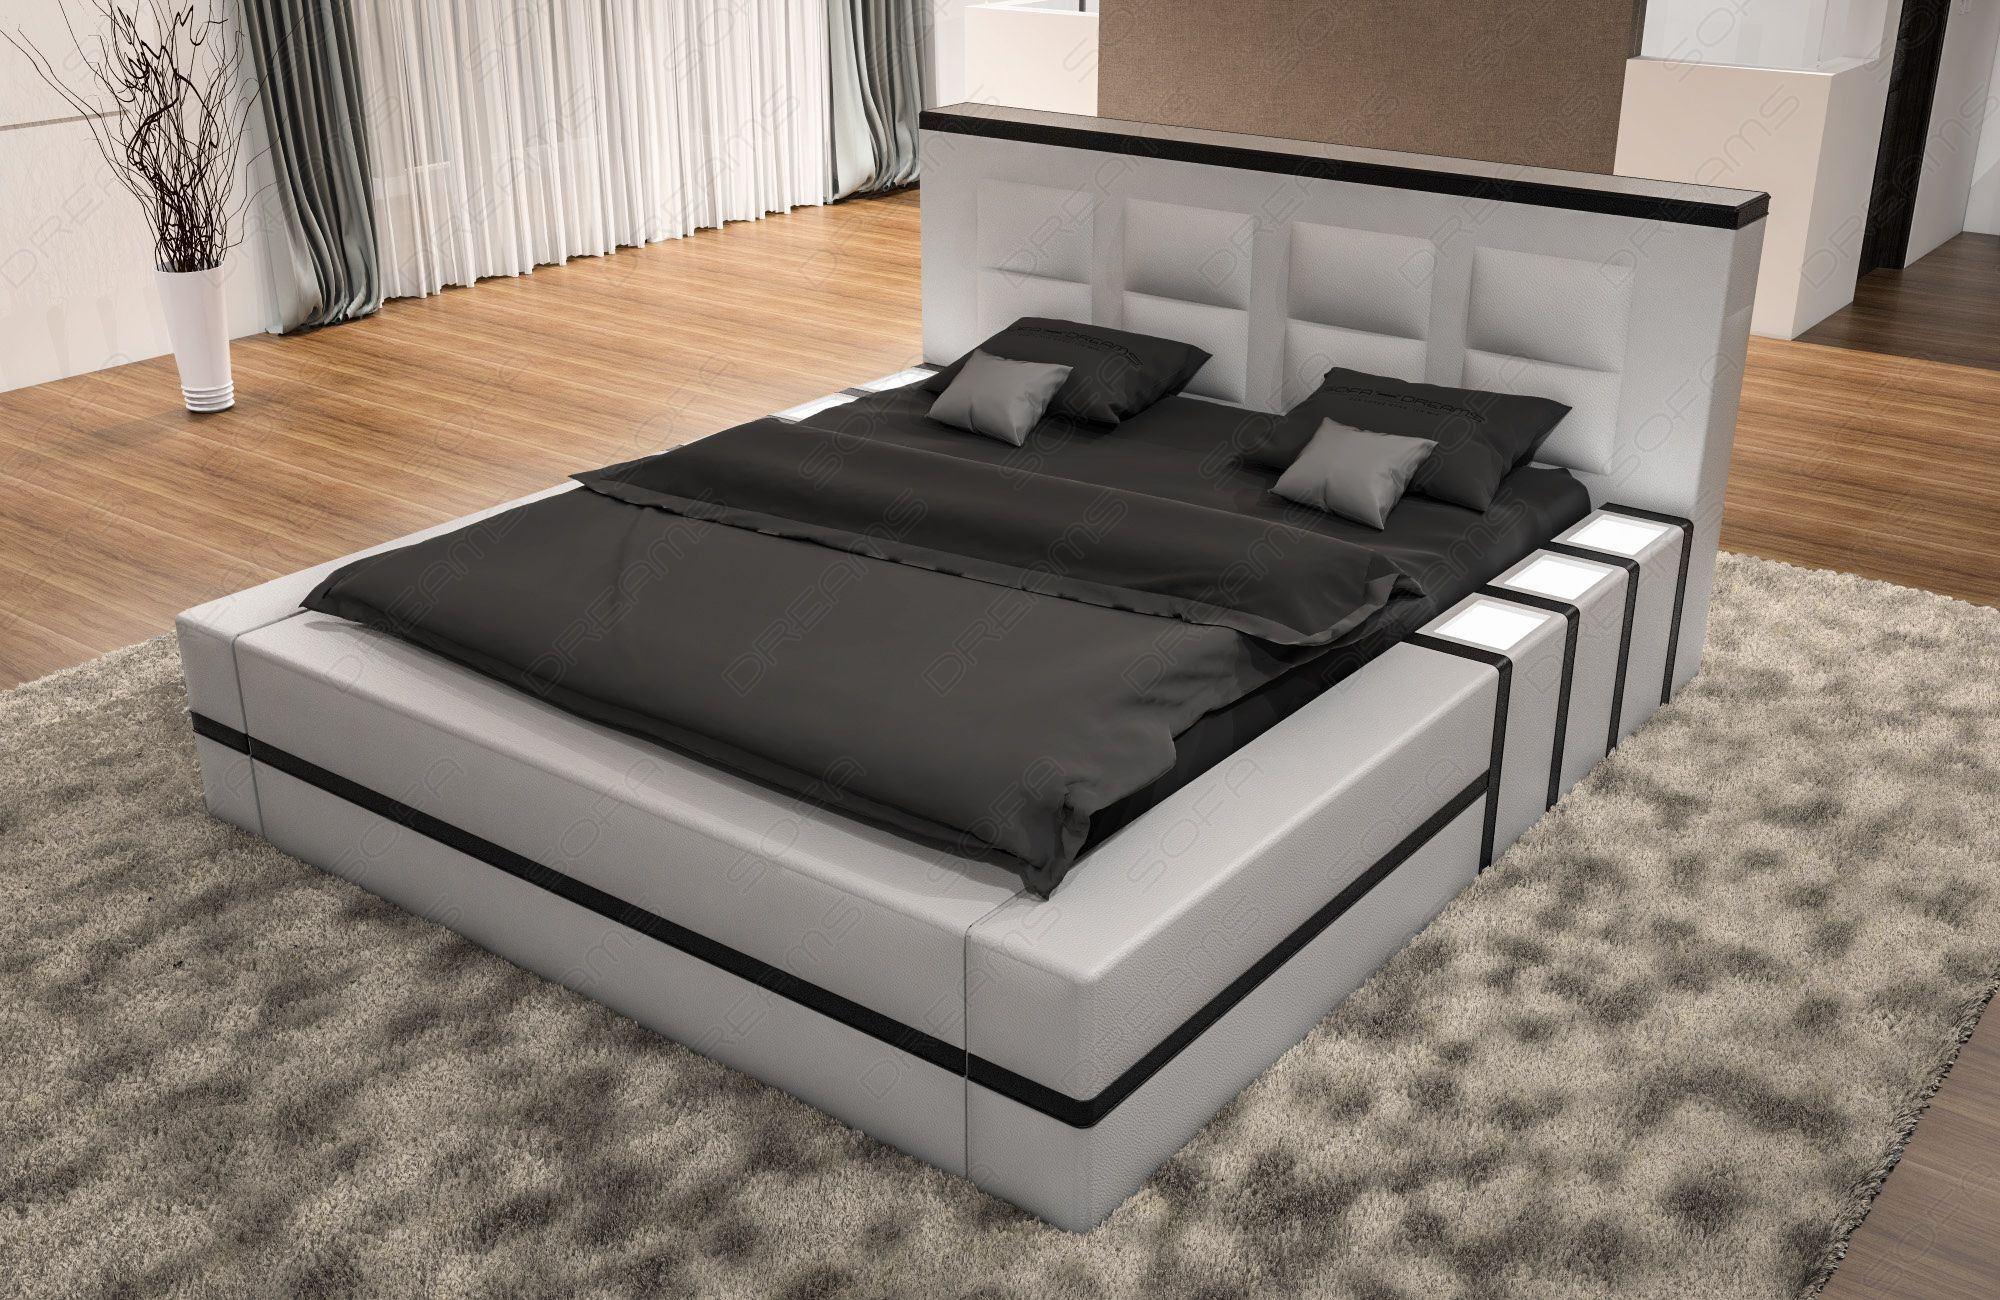 Full Size of Polsterbett Asti In Schwarz Wei Moderne Betten 200x220 Bett Wohnzimmer Polsterbett 200x220